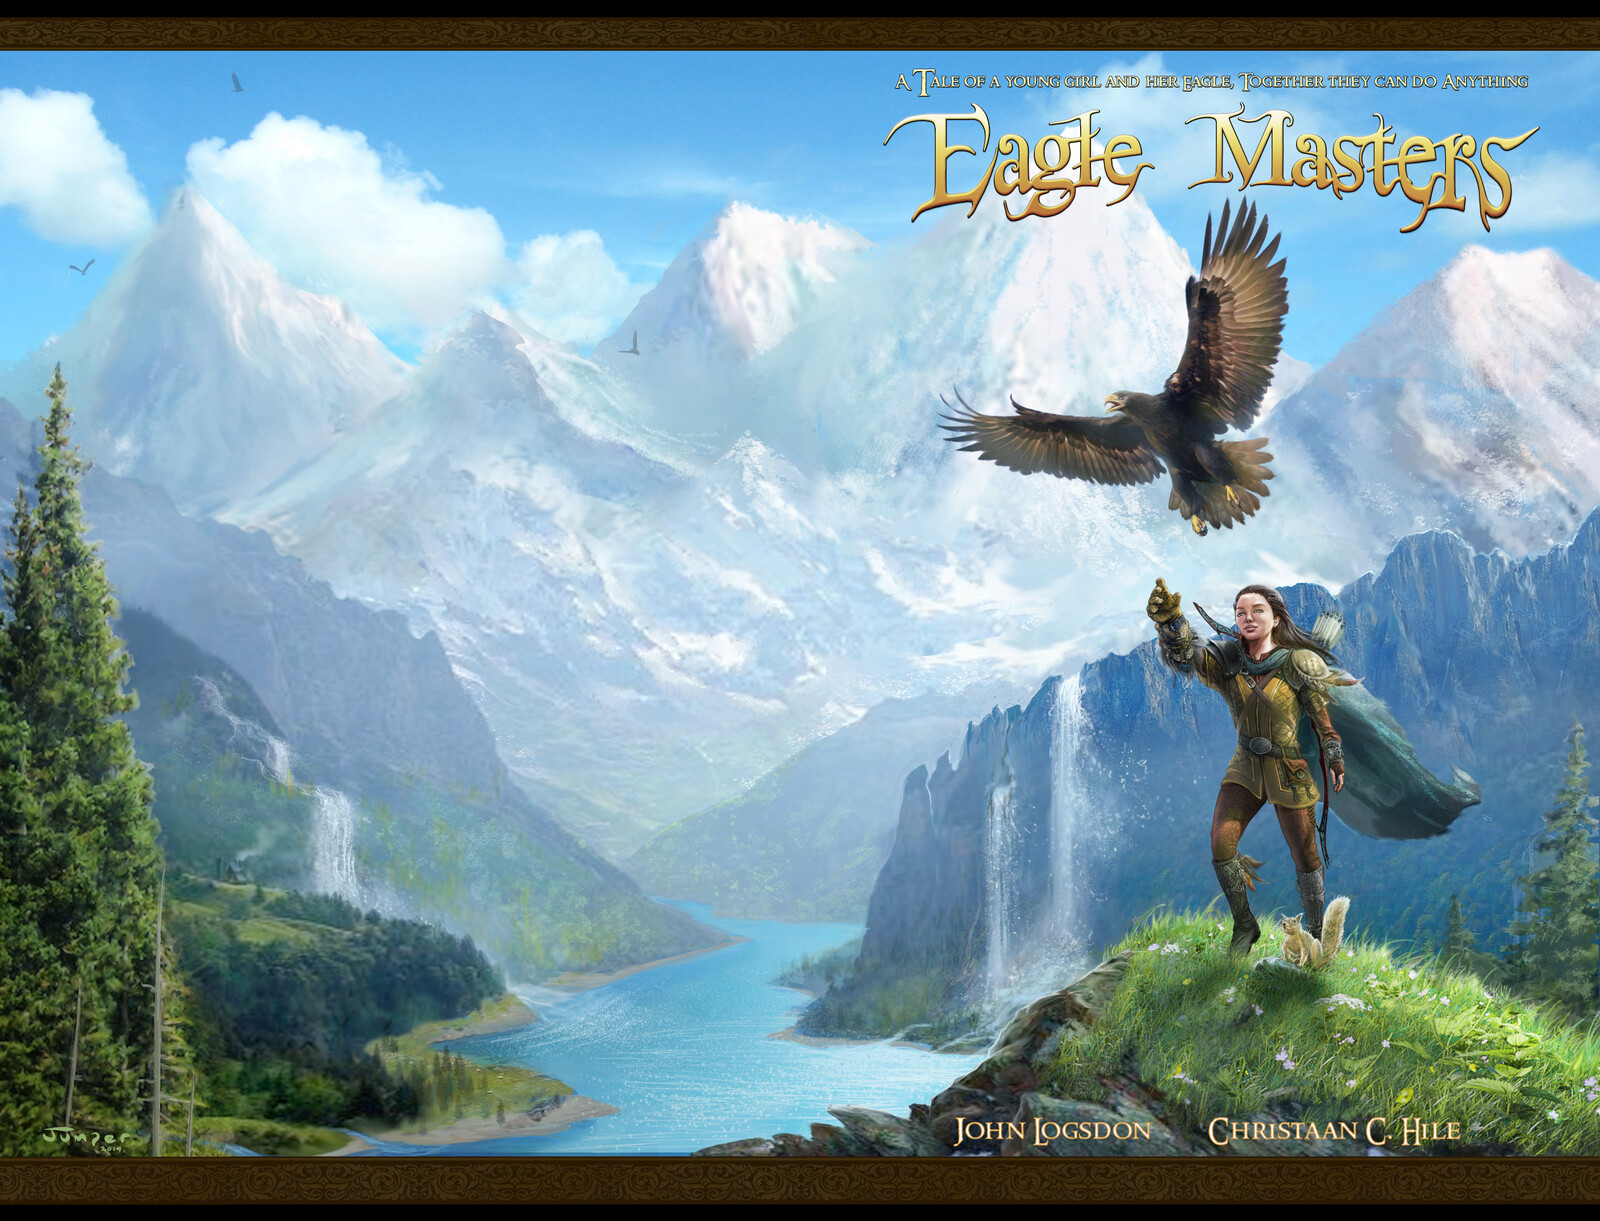 Eagle Masters Book cover